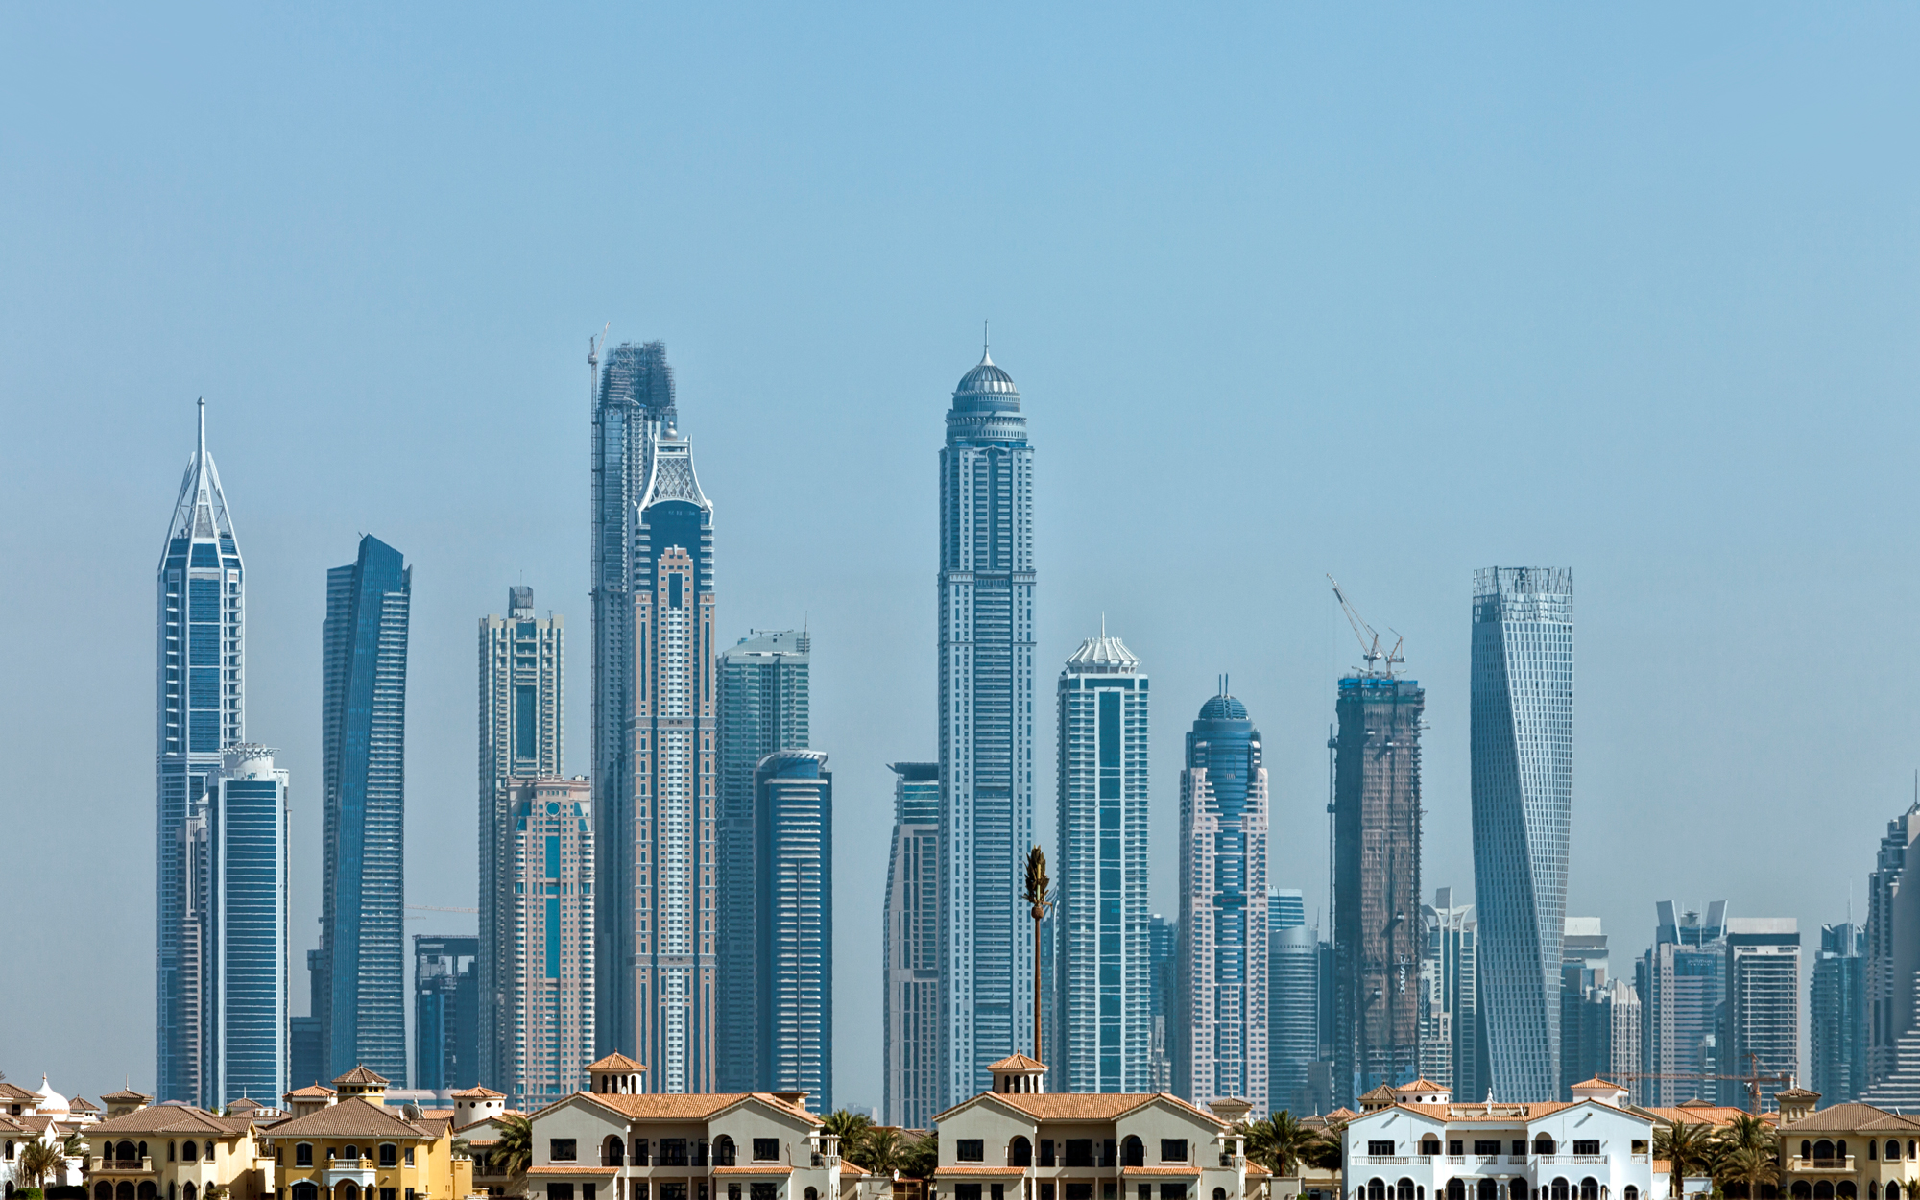 4. Marina 101 (Дубай, ОАЭ) – 427 метров.